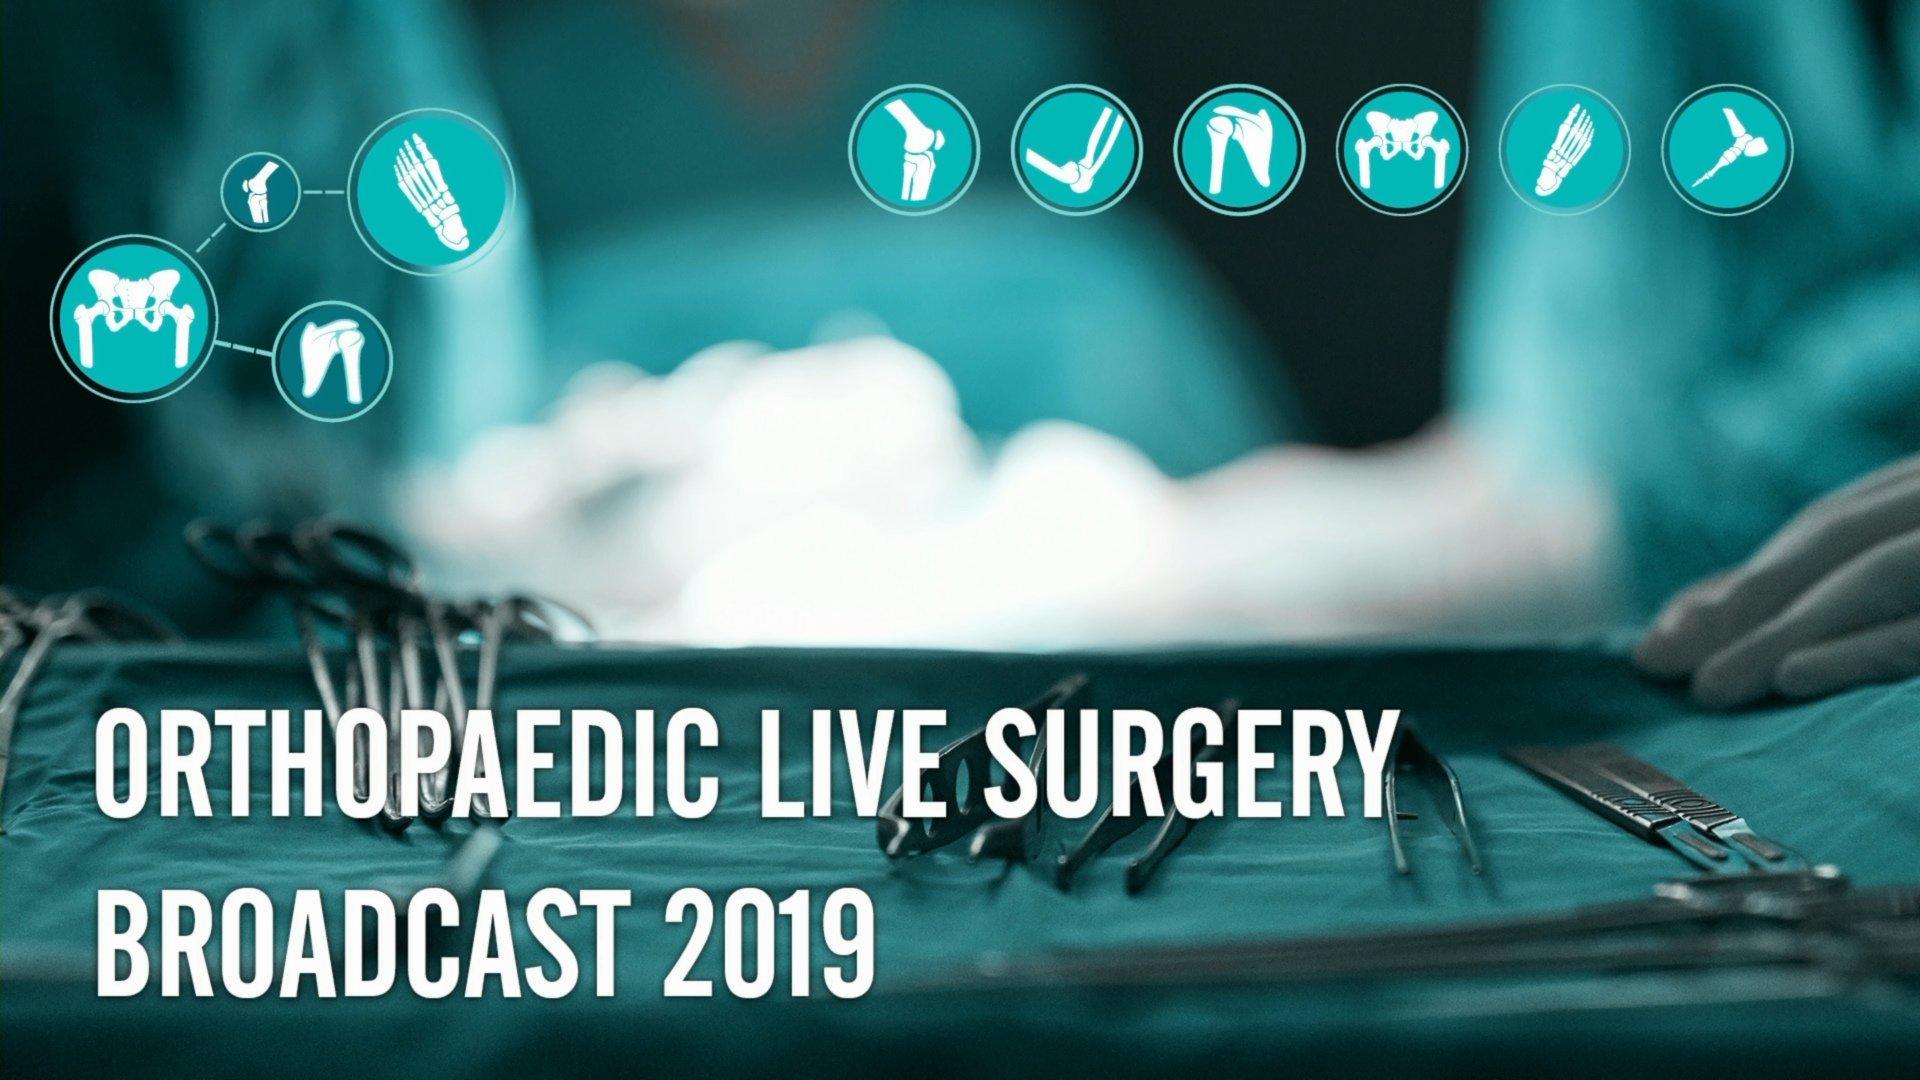 Orthopaedic Live Surgery Broadcast 2019